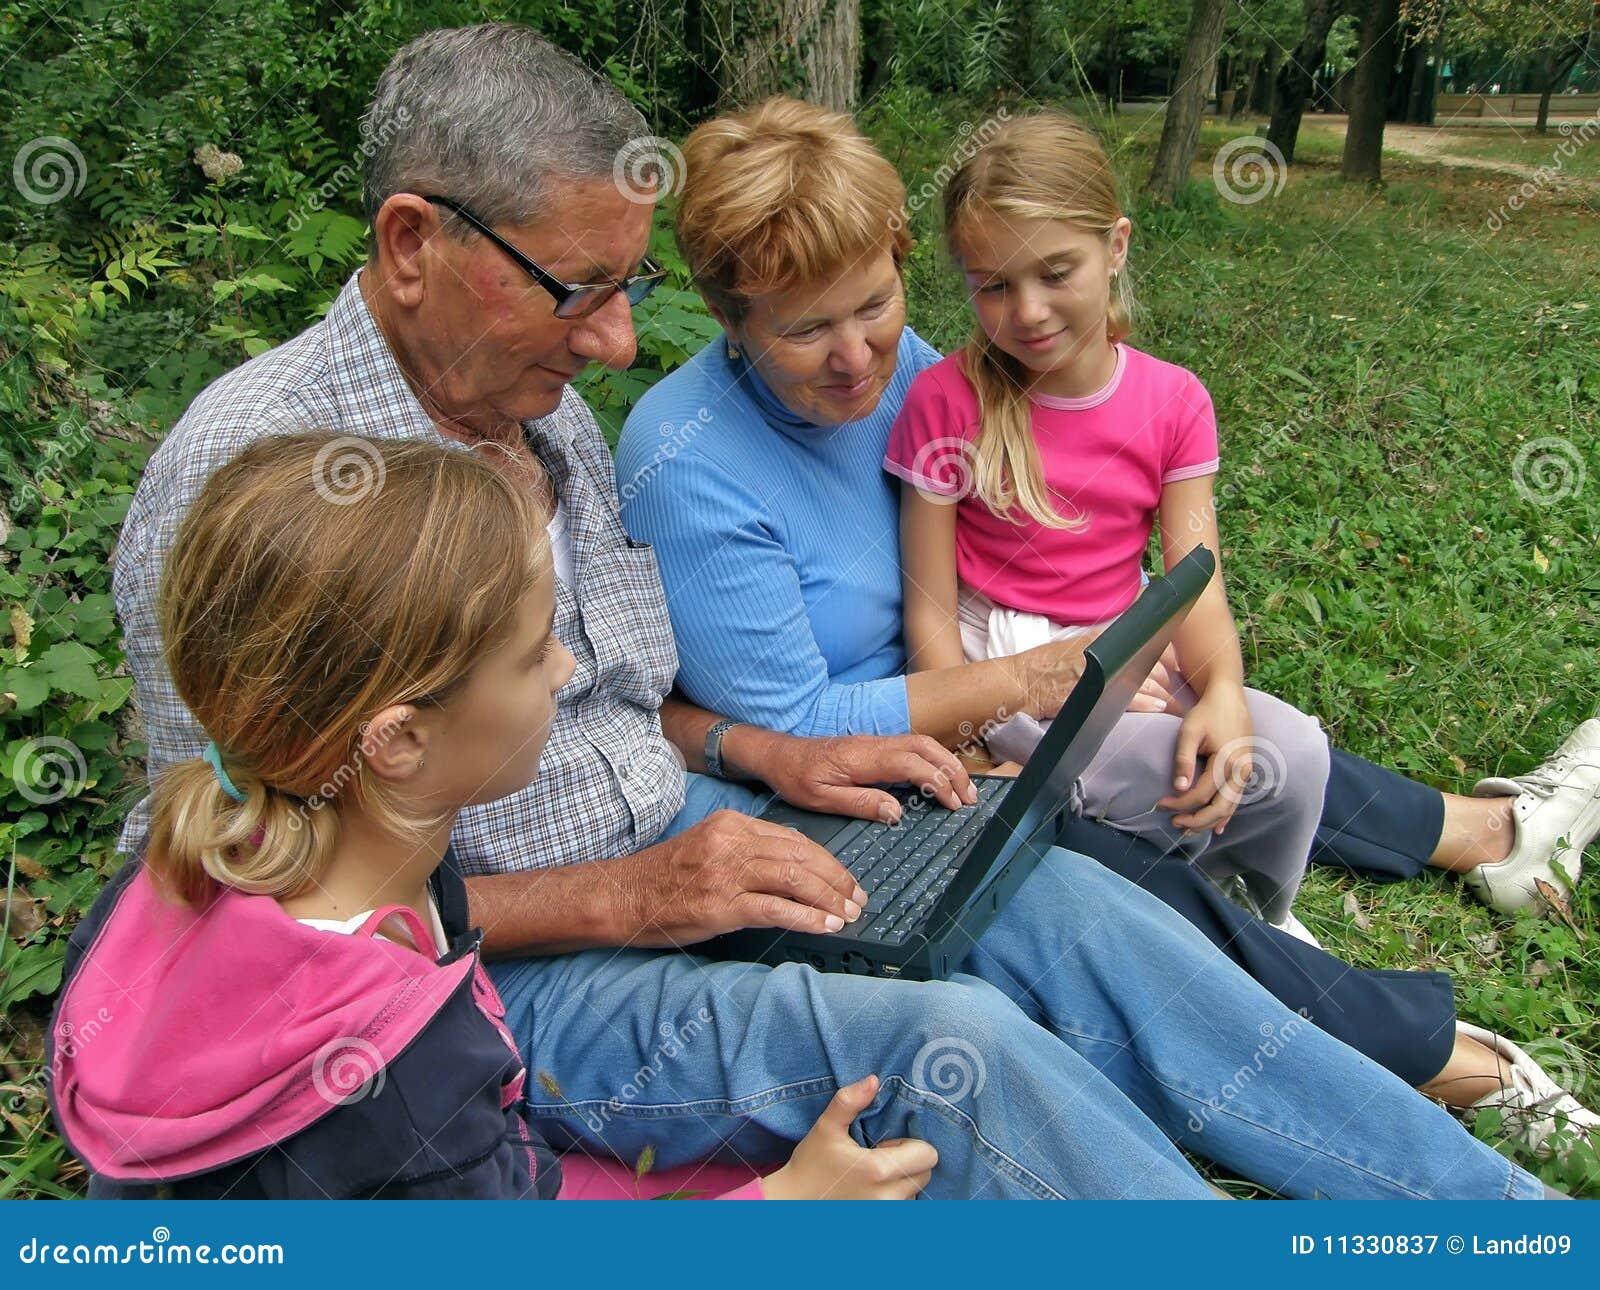 Grandparent, twins grandchild with laptop